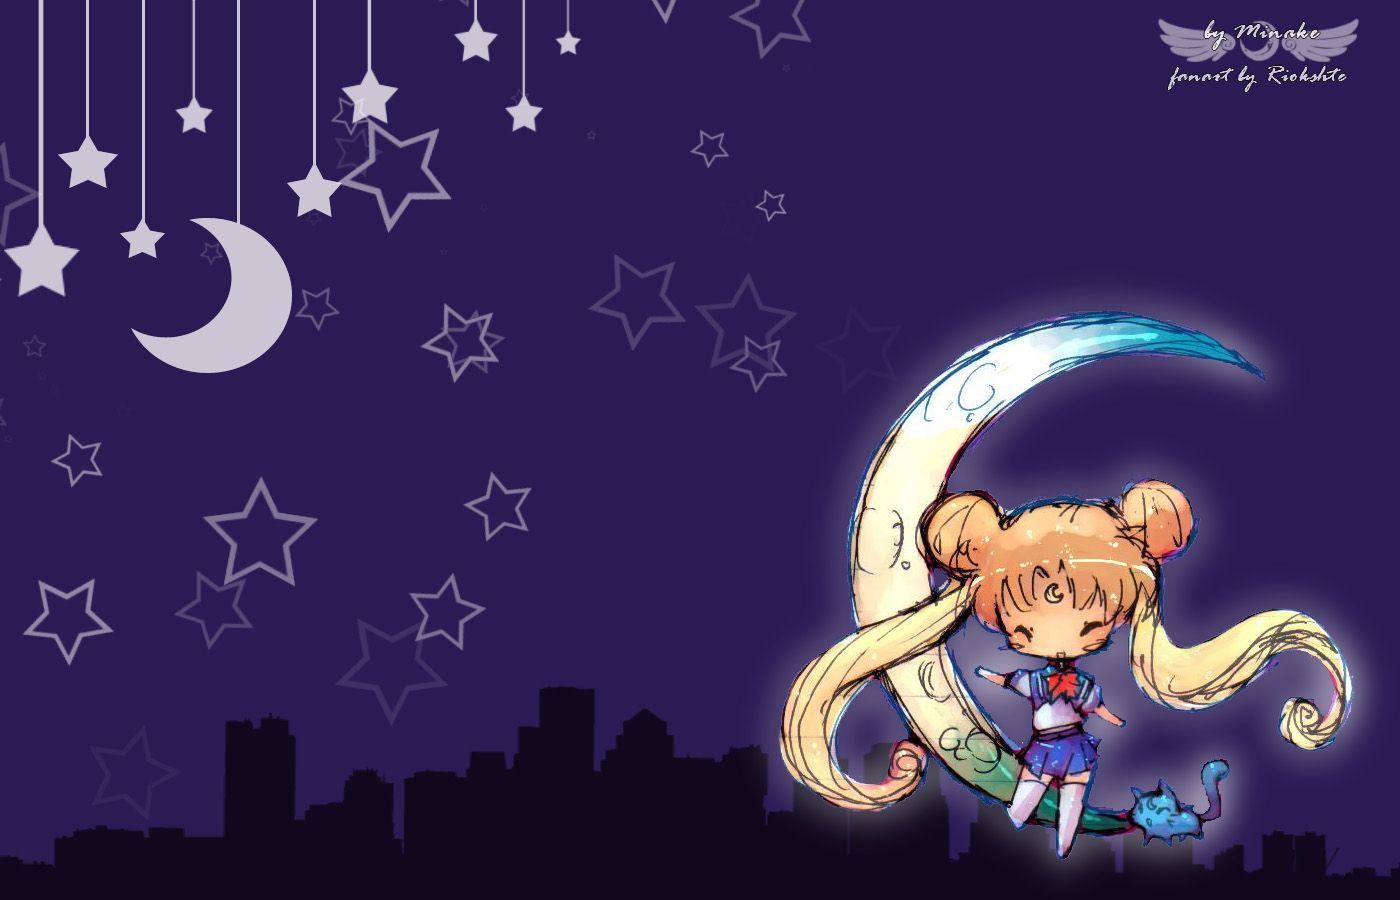 Sailor Moon Chibi Desktop Hd Wallpaper Walldevice Com Sailor Moon Wallpaper Sailor Moon Aesthetic Chibi Wallpaper